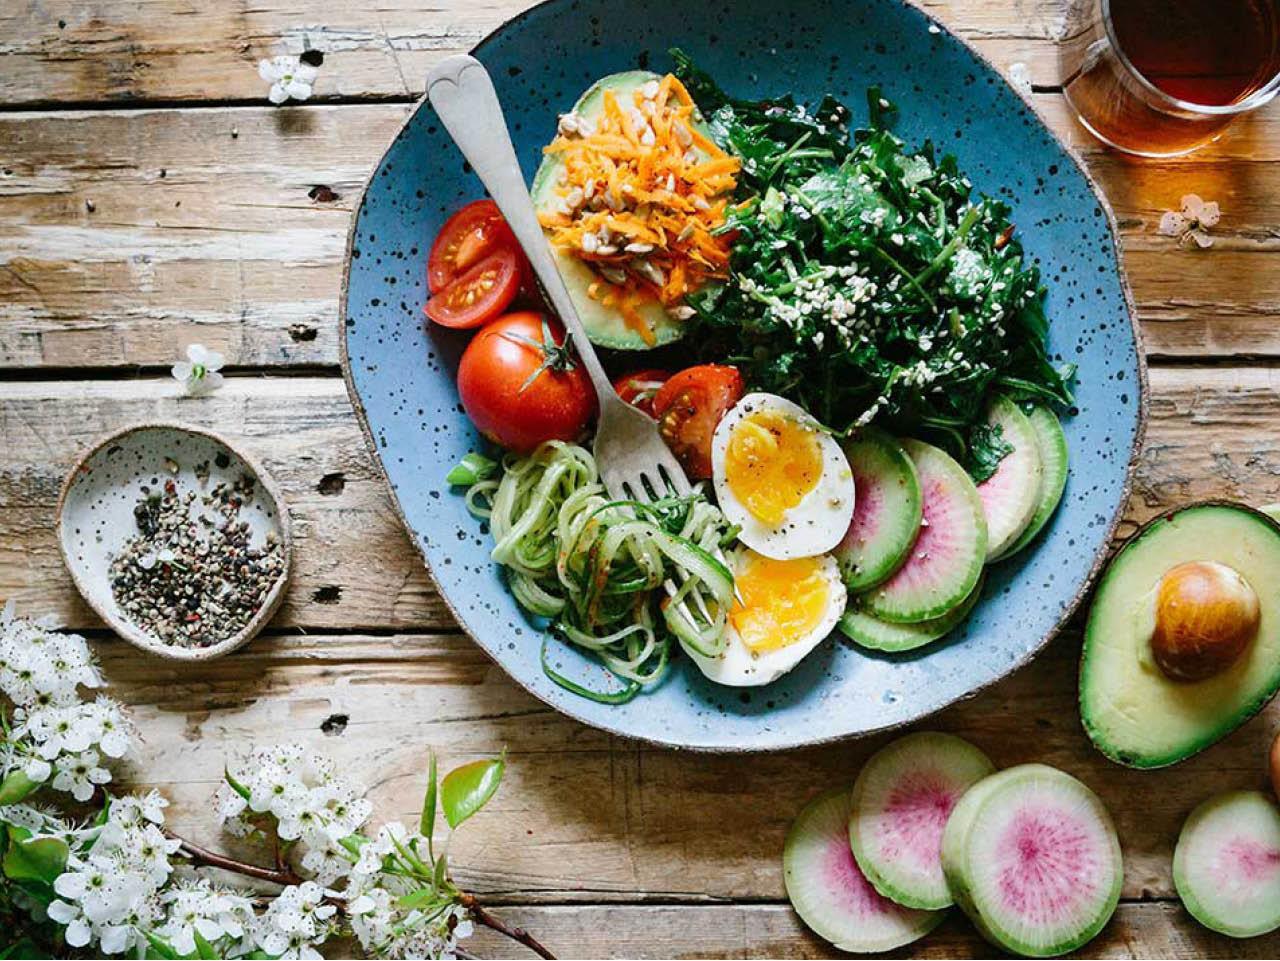 calendario semanal dieta equilibrada